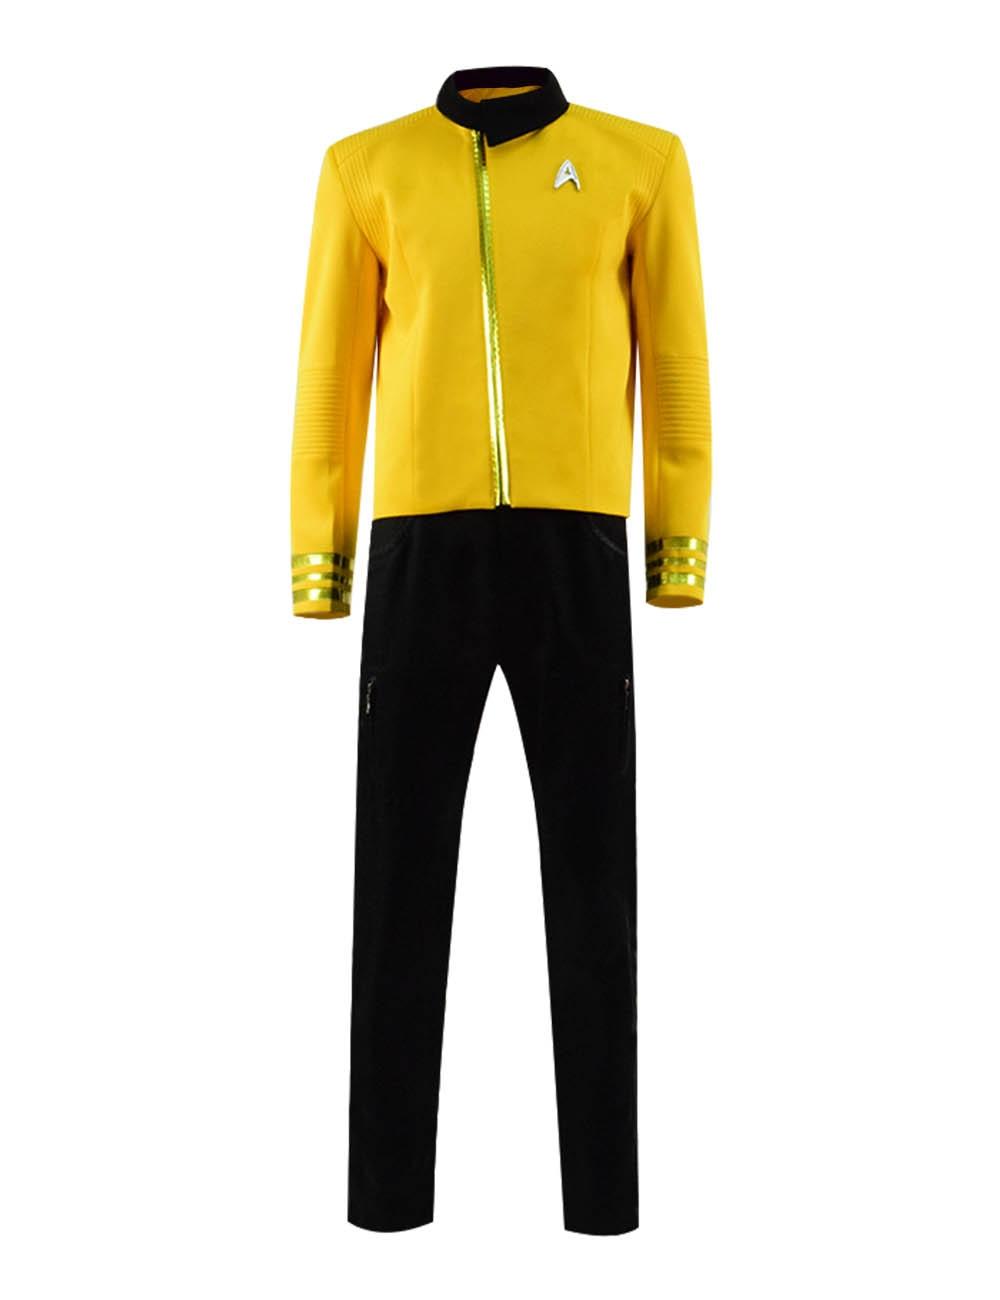 Star Trek Yellow Uniform Full Set Cosplay Costume Party Show Men Cosplay